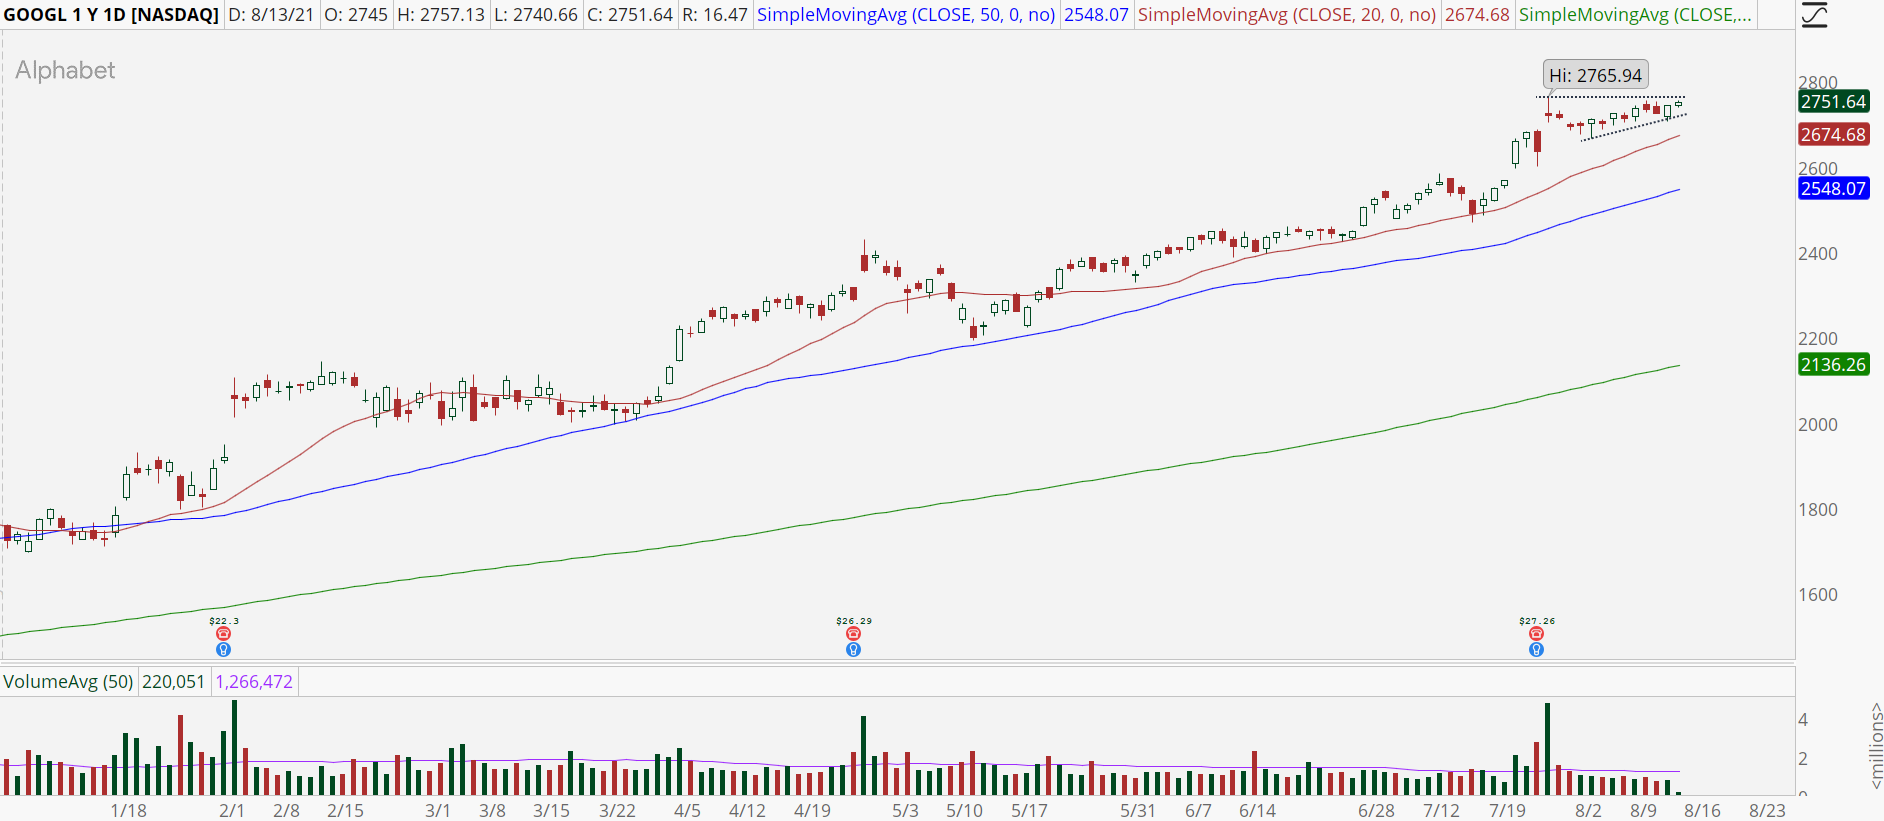 Alphabet (GOOGL, GOOG) stock chart with high base breakout pattern